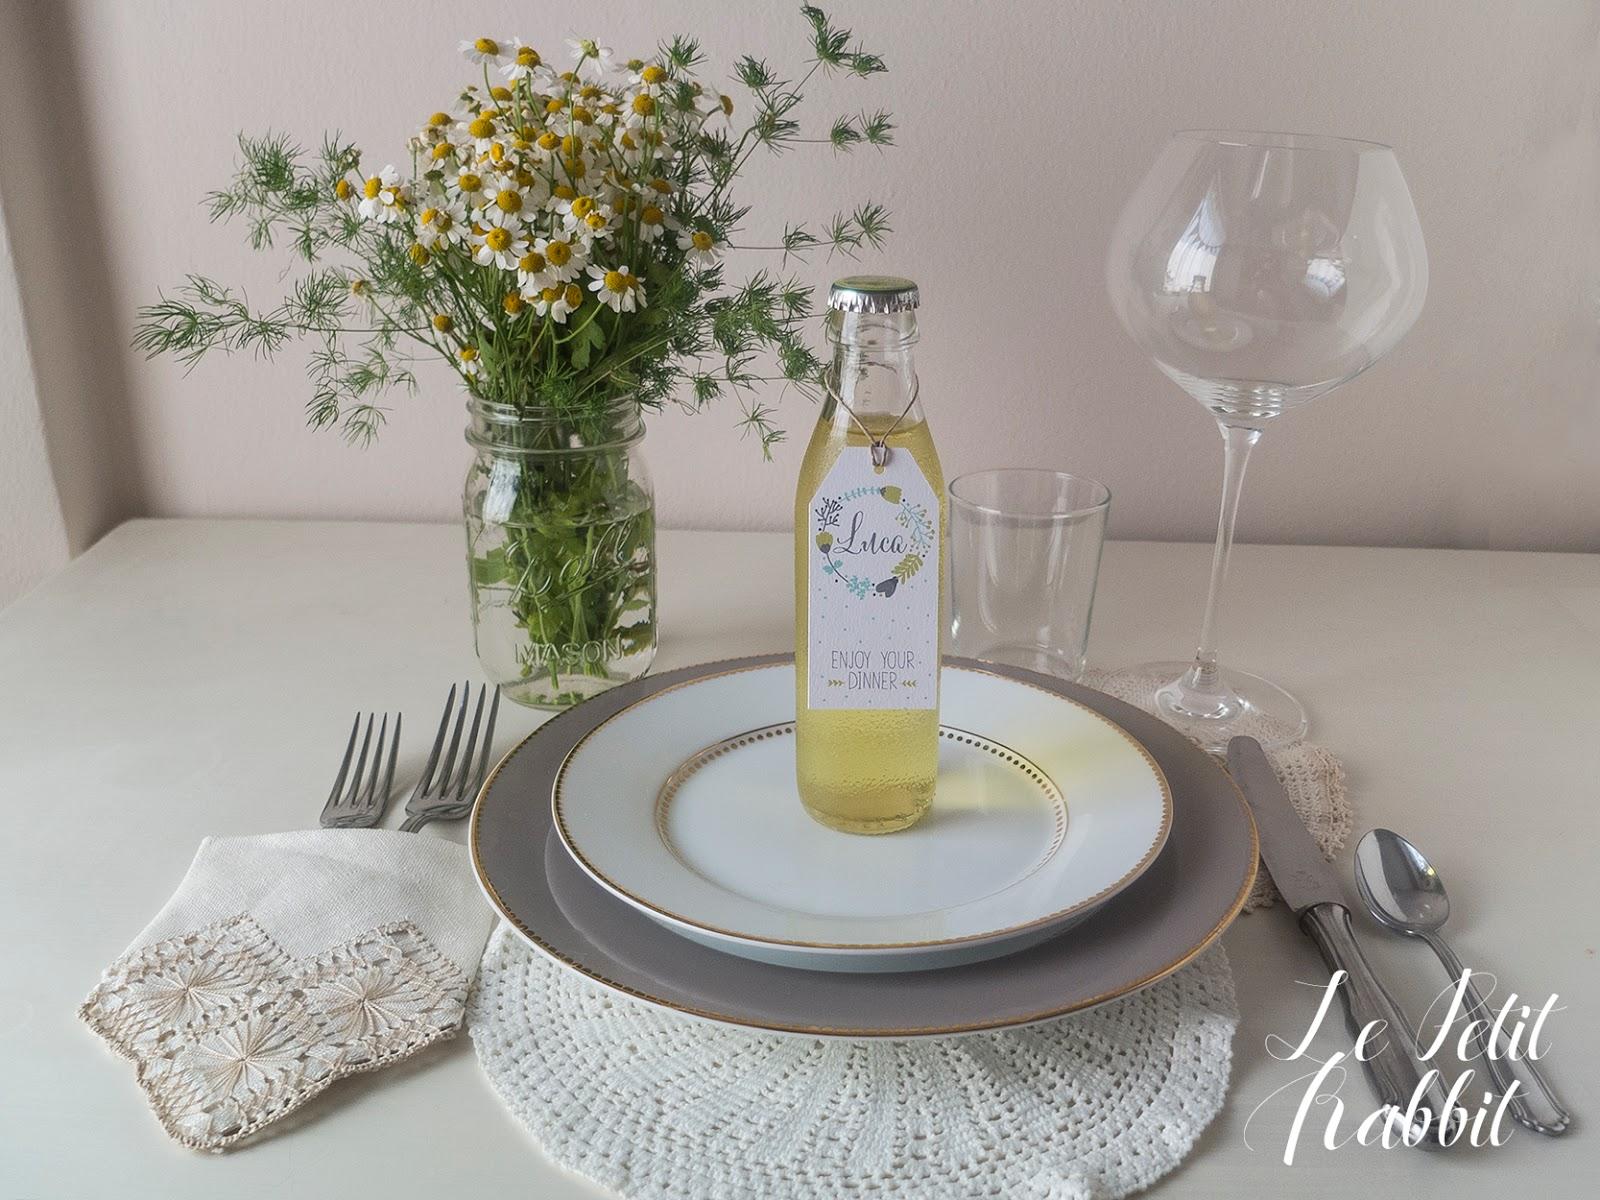 Segnaposto Matrimonio Azzurro : Wedding tips il segnaposto le petit rabbit